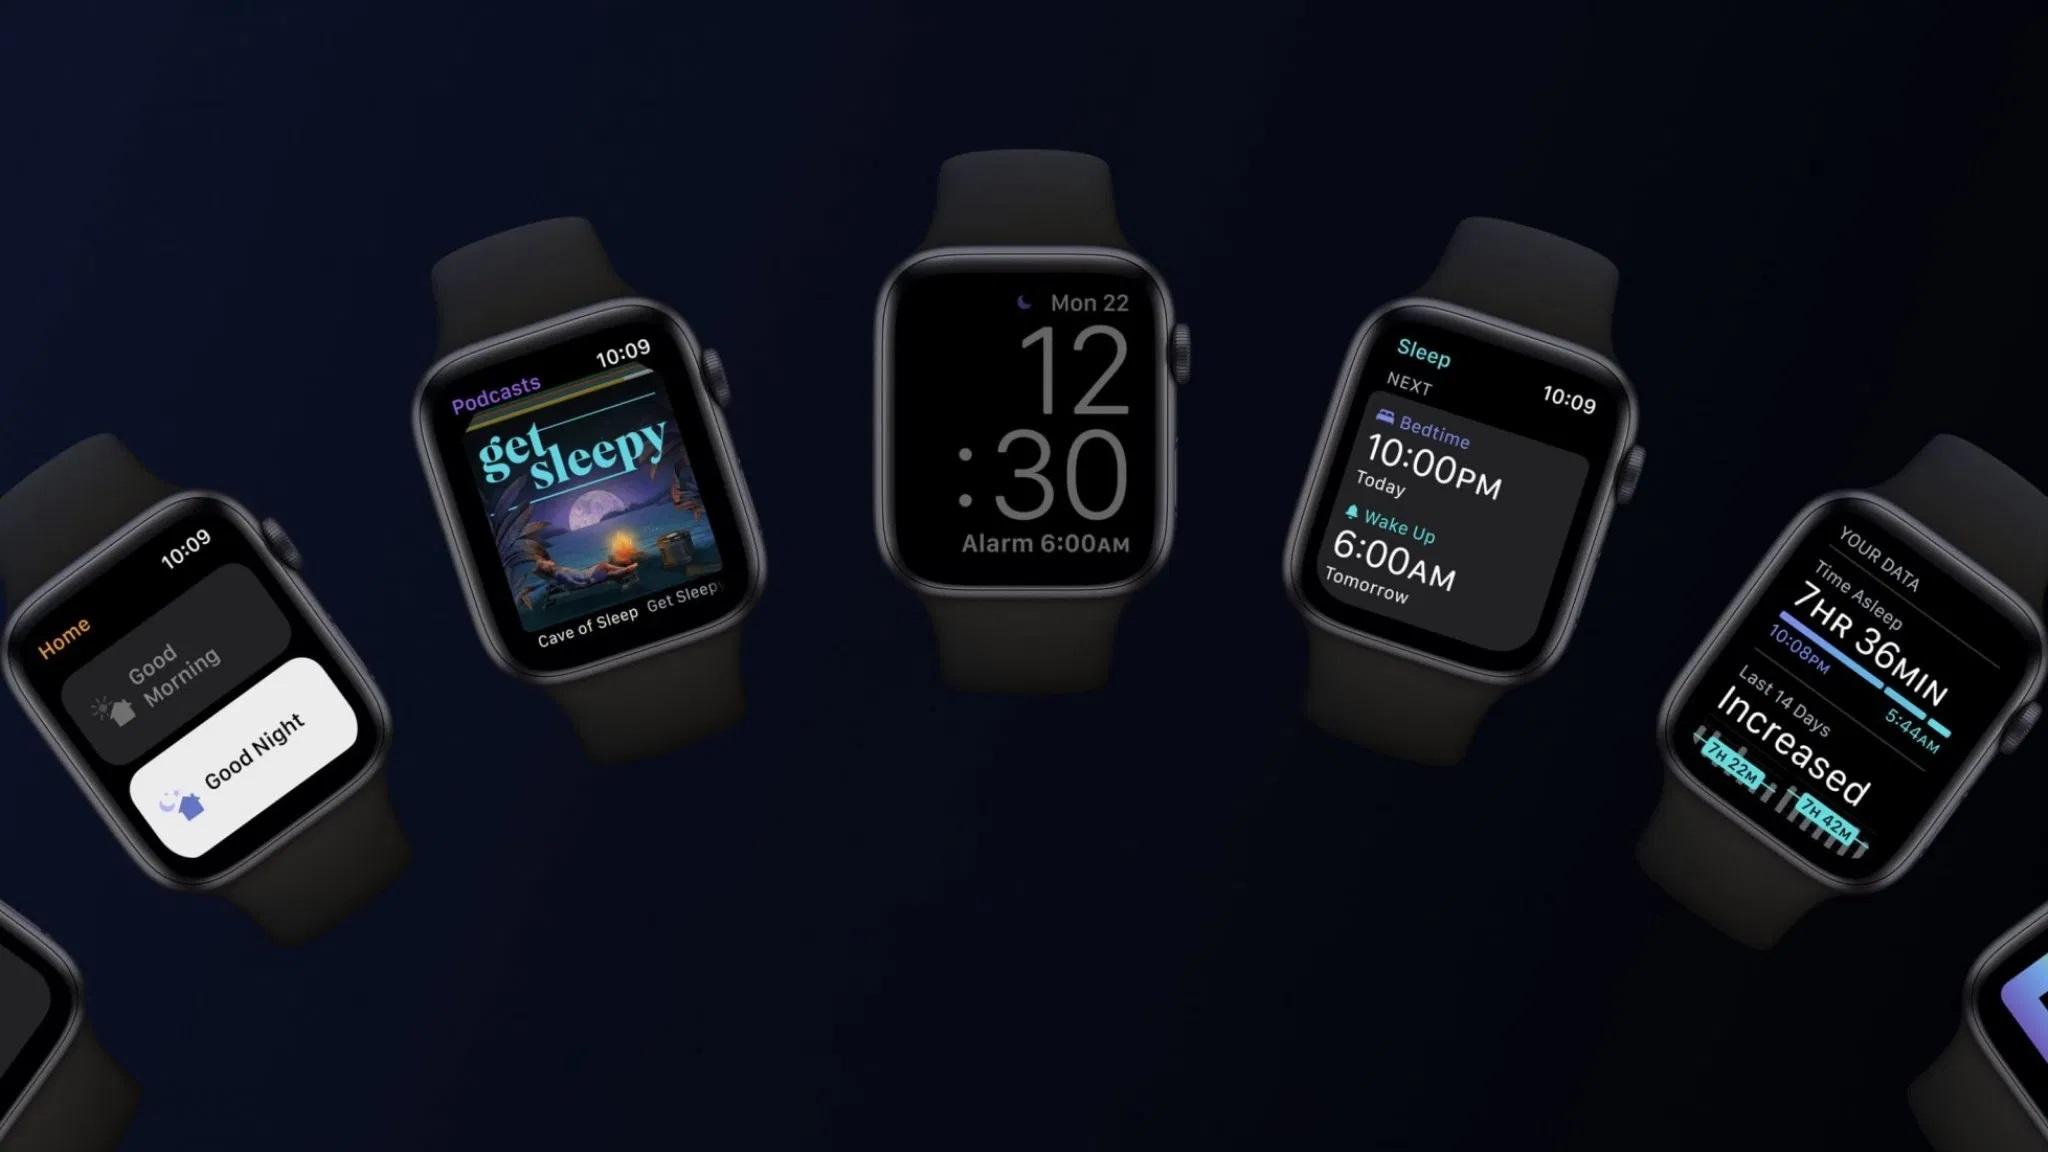 Apple готовит бюджетную версию Apple Watch без ЭКГ и Always on Display